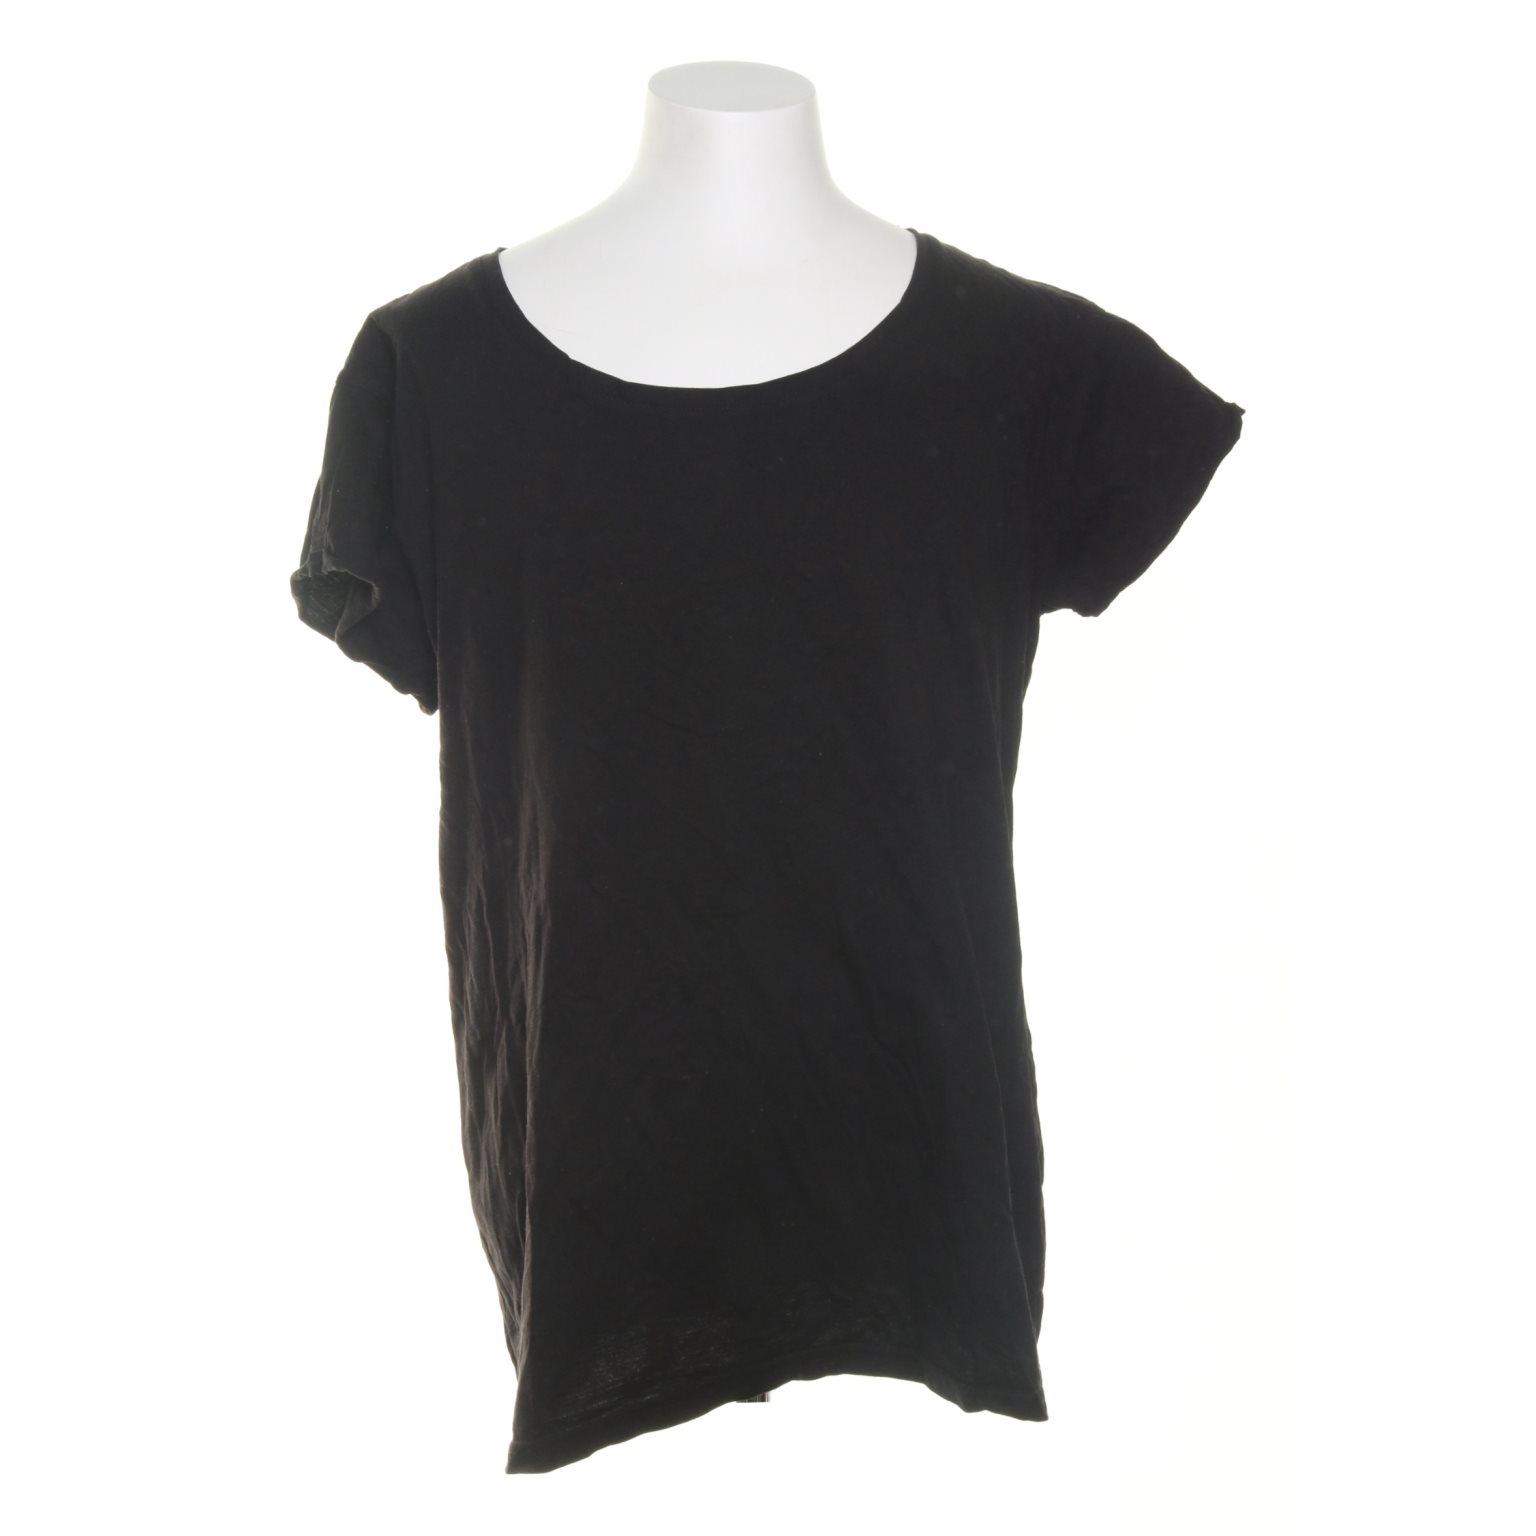 Things To Appreciate, T-shirt, Strl: XL, Svart